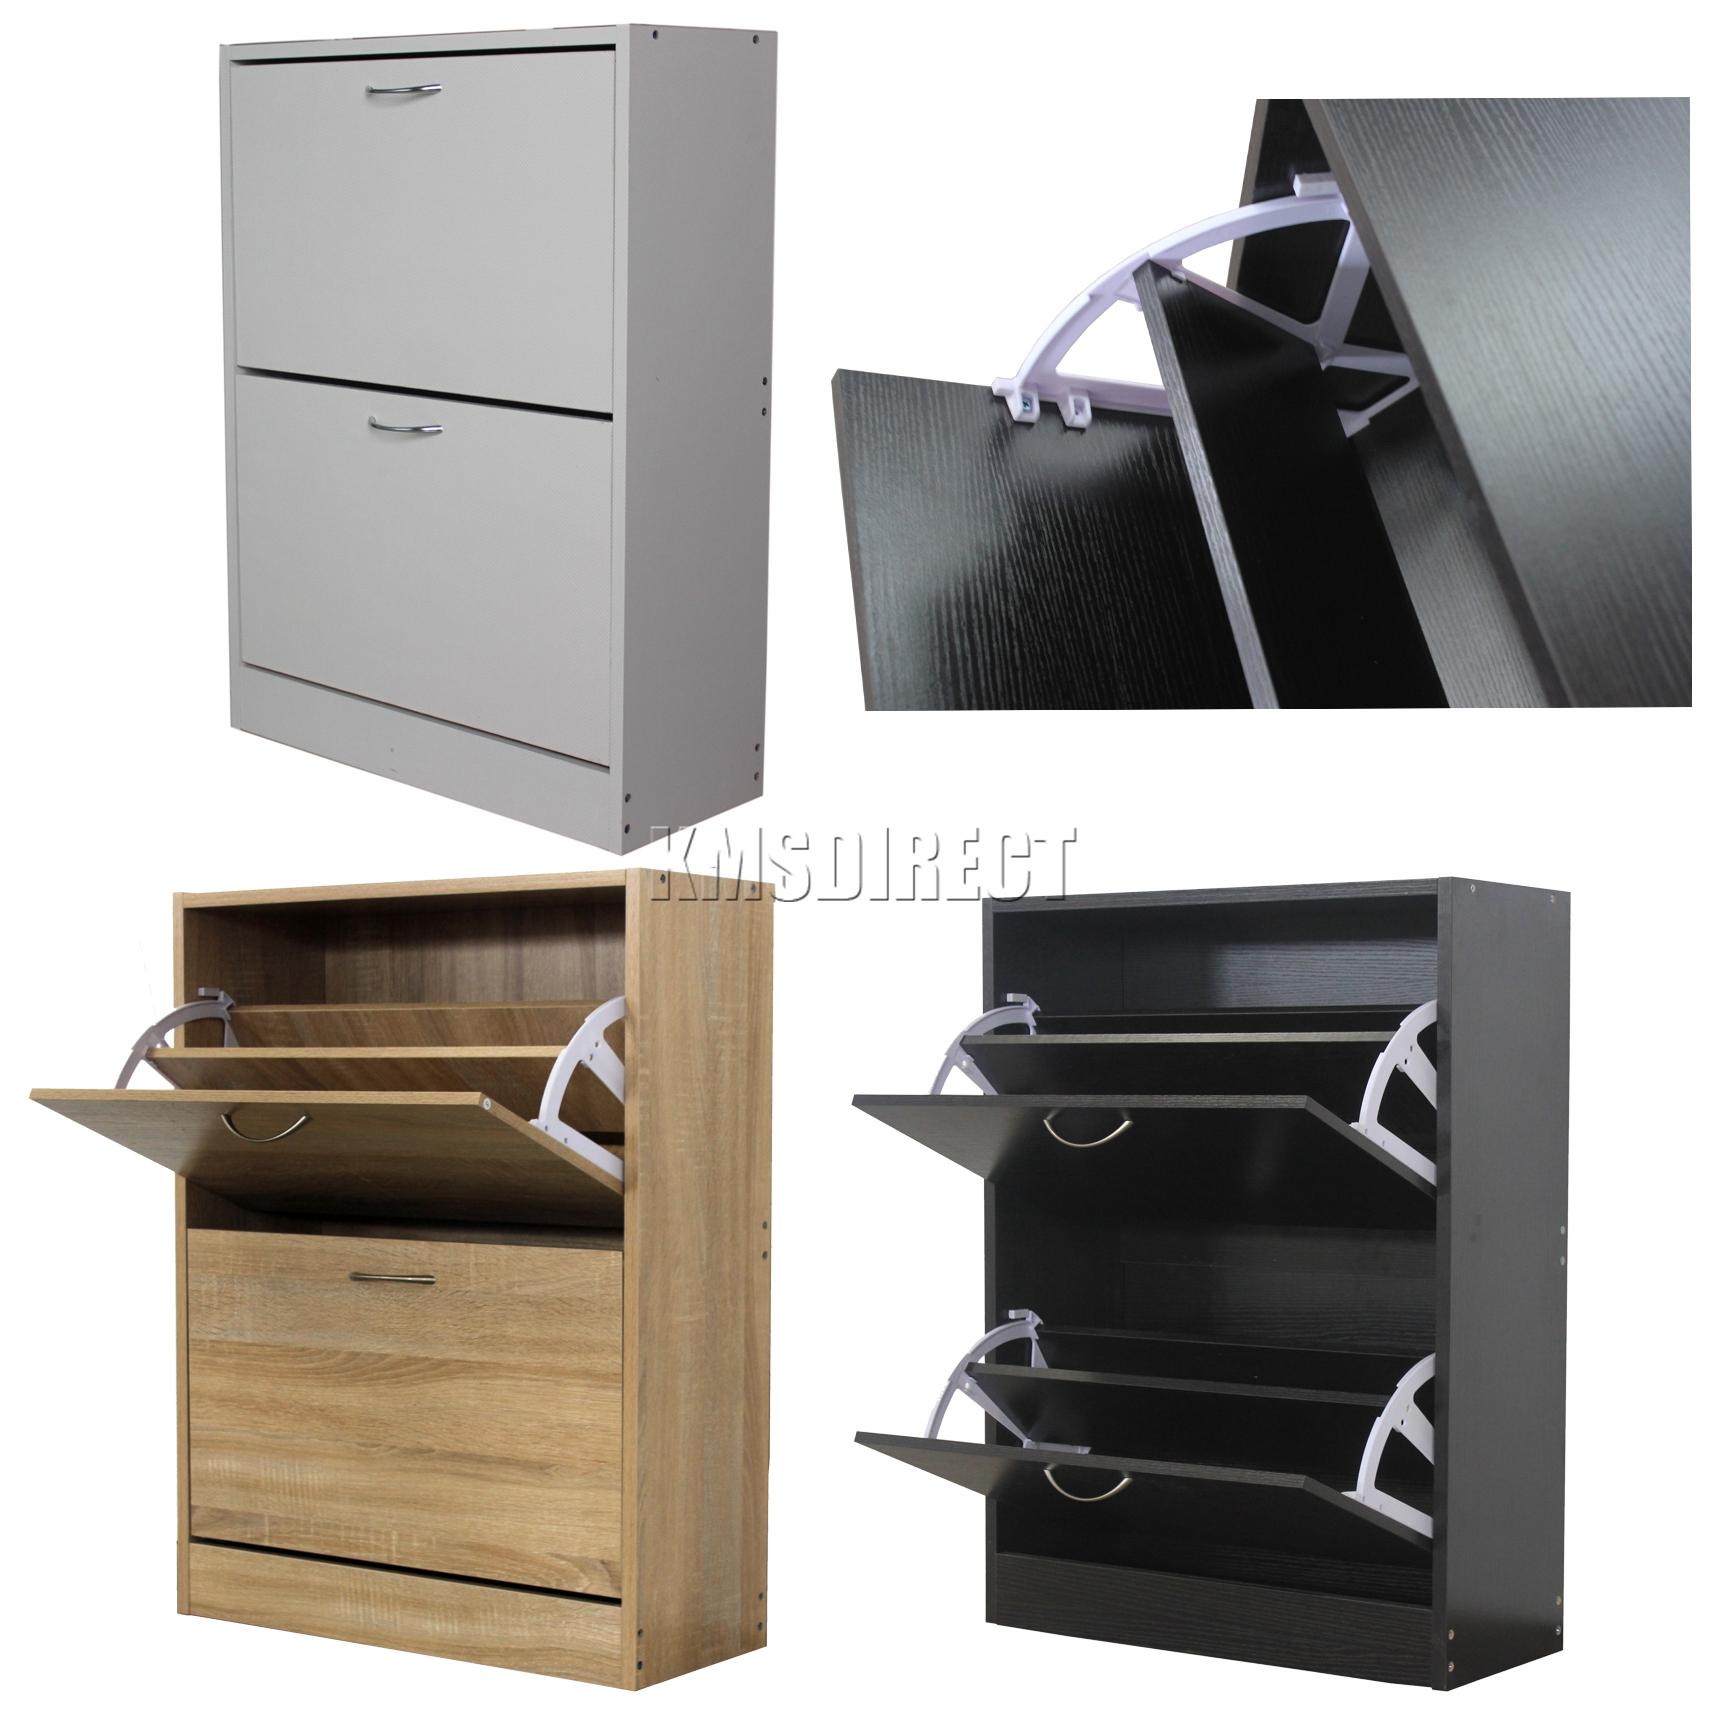 FoxHunter Wooden Shoe Storage Cabinet 2 Drawer Footwear